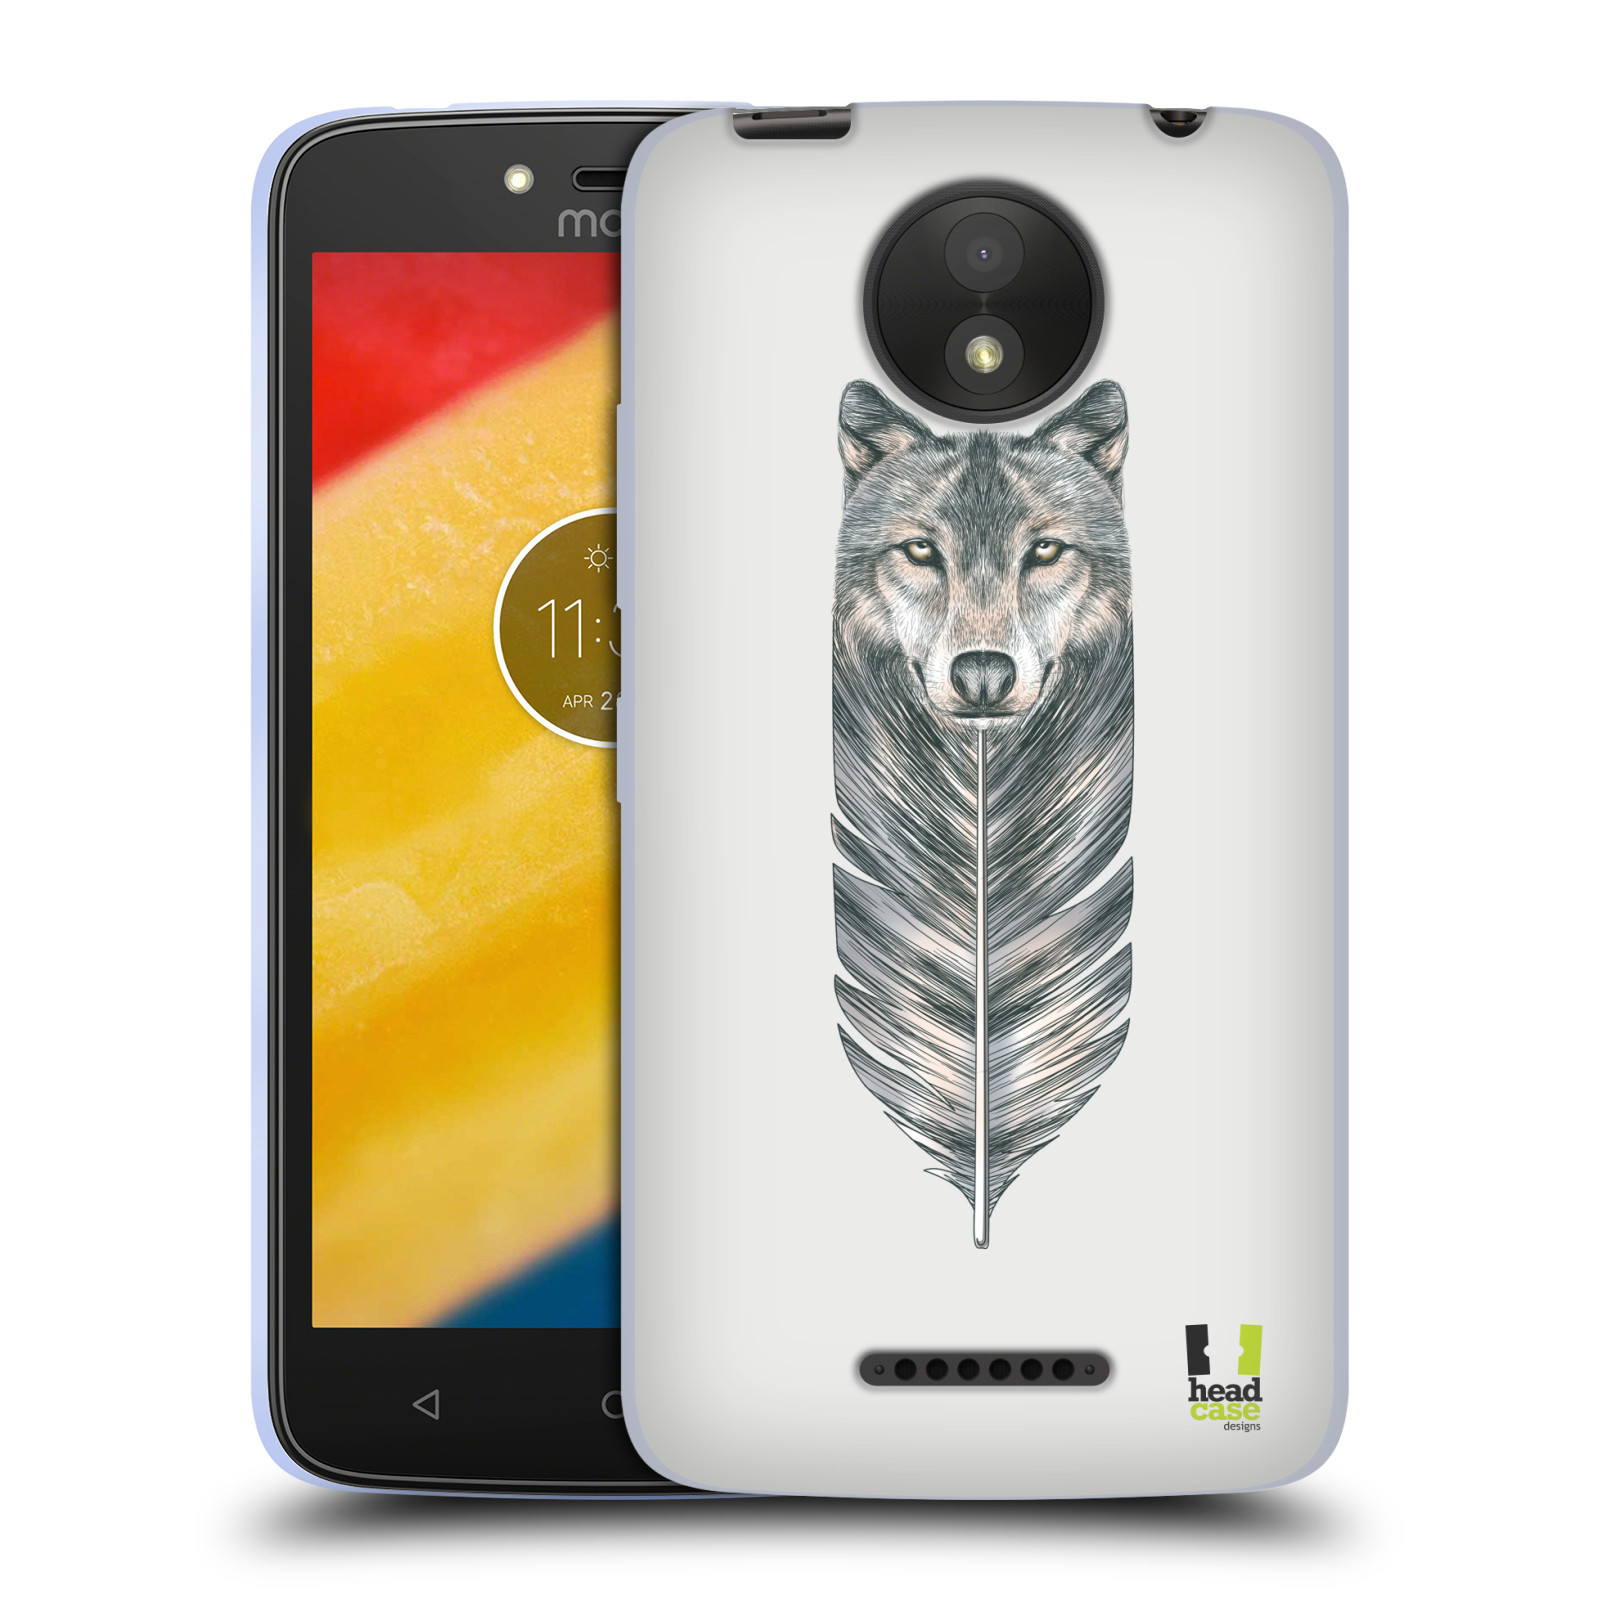 Silikonové pouzdro na mobil Lenovo Moto C Plus - Head Case - PÍRKO VLK (Silikonový kryt či obal na mobilní telefon Lenovo Moto C Plus s motivem PÍRKO VLK)